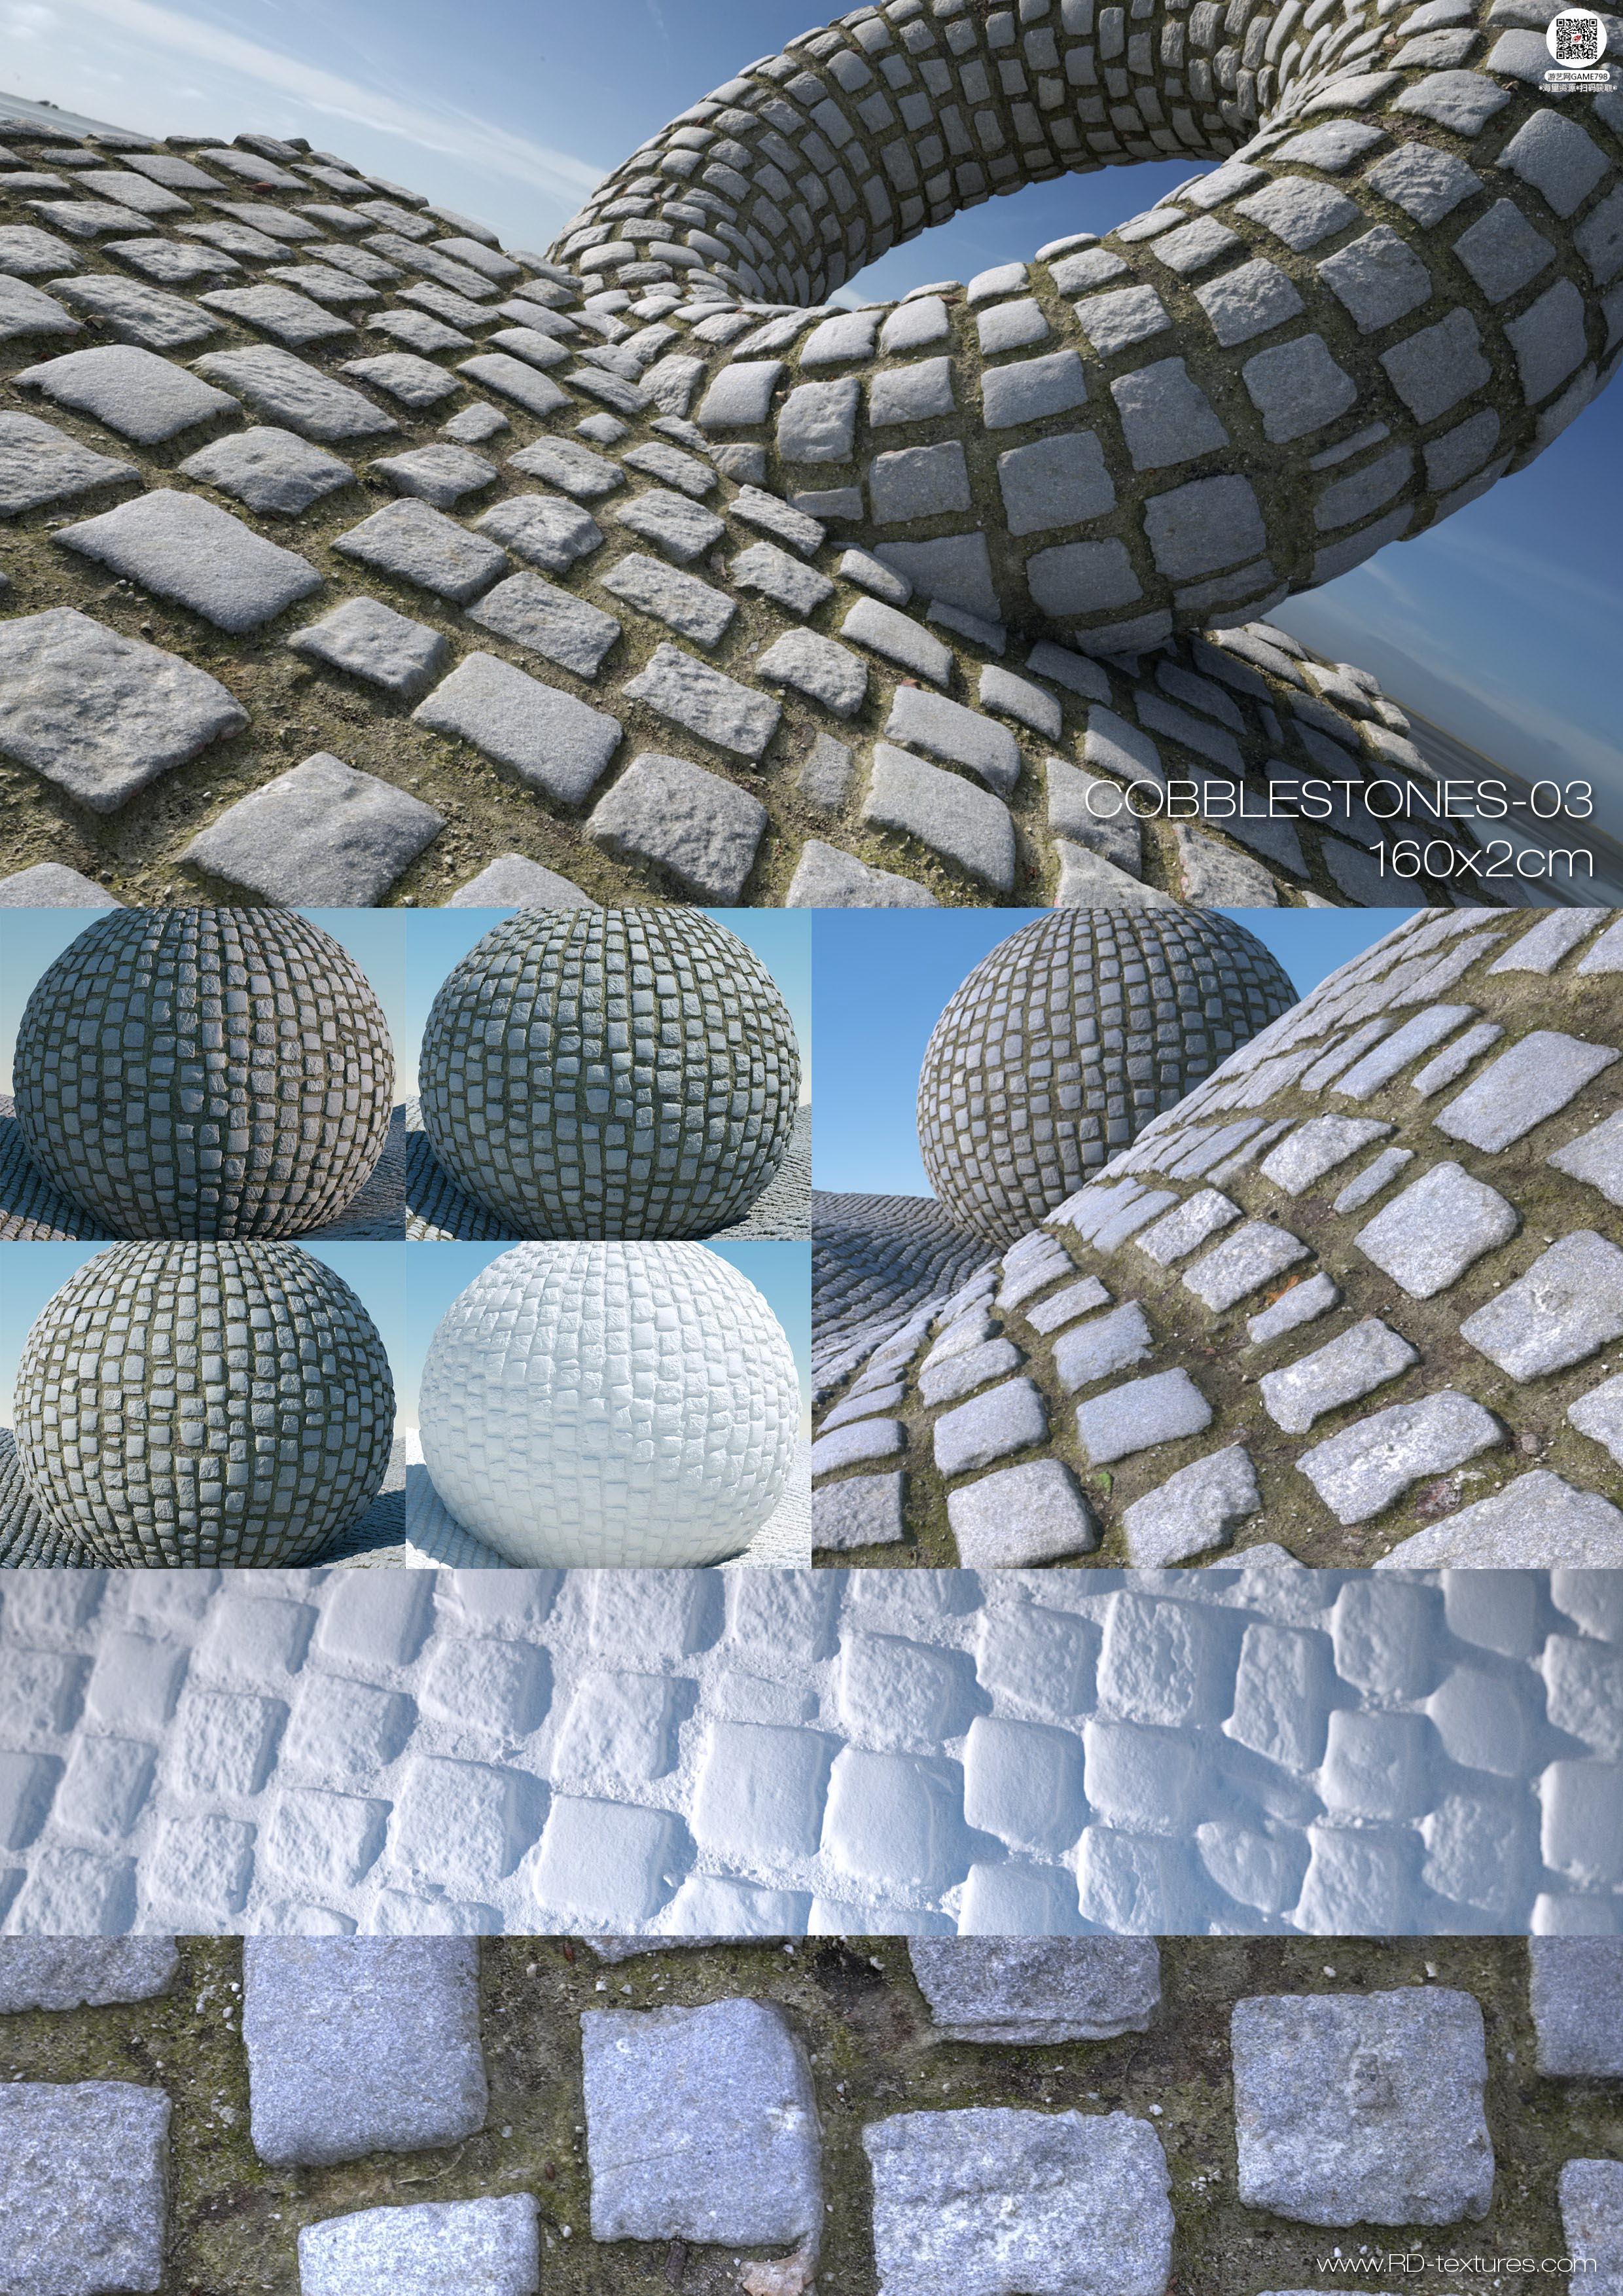 COBBLESTONES-03_160x2cm.jpg